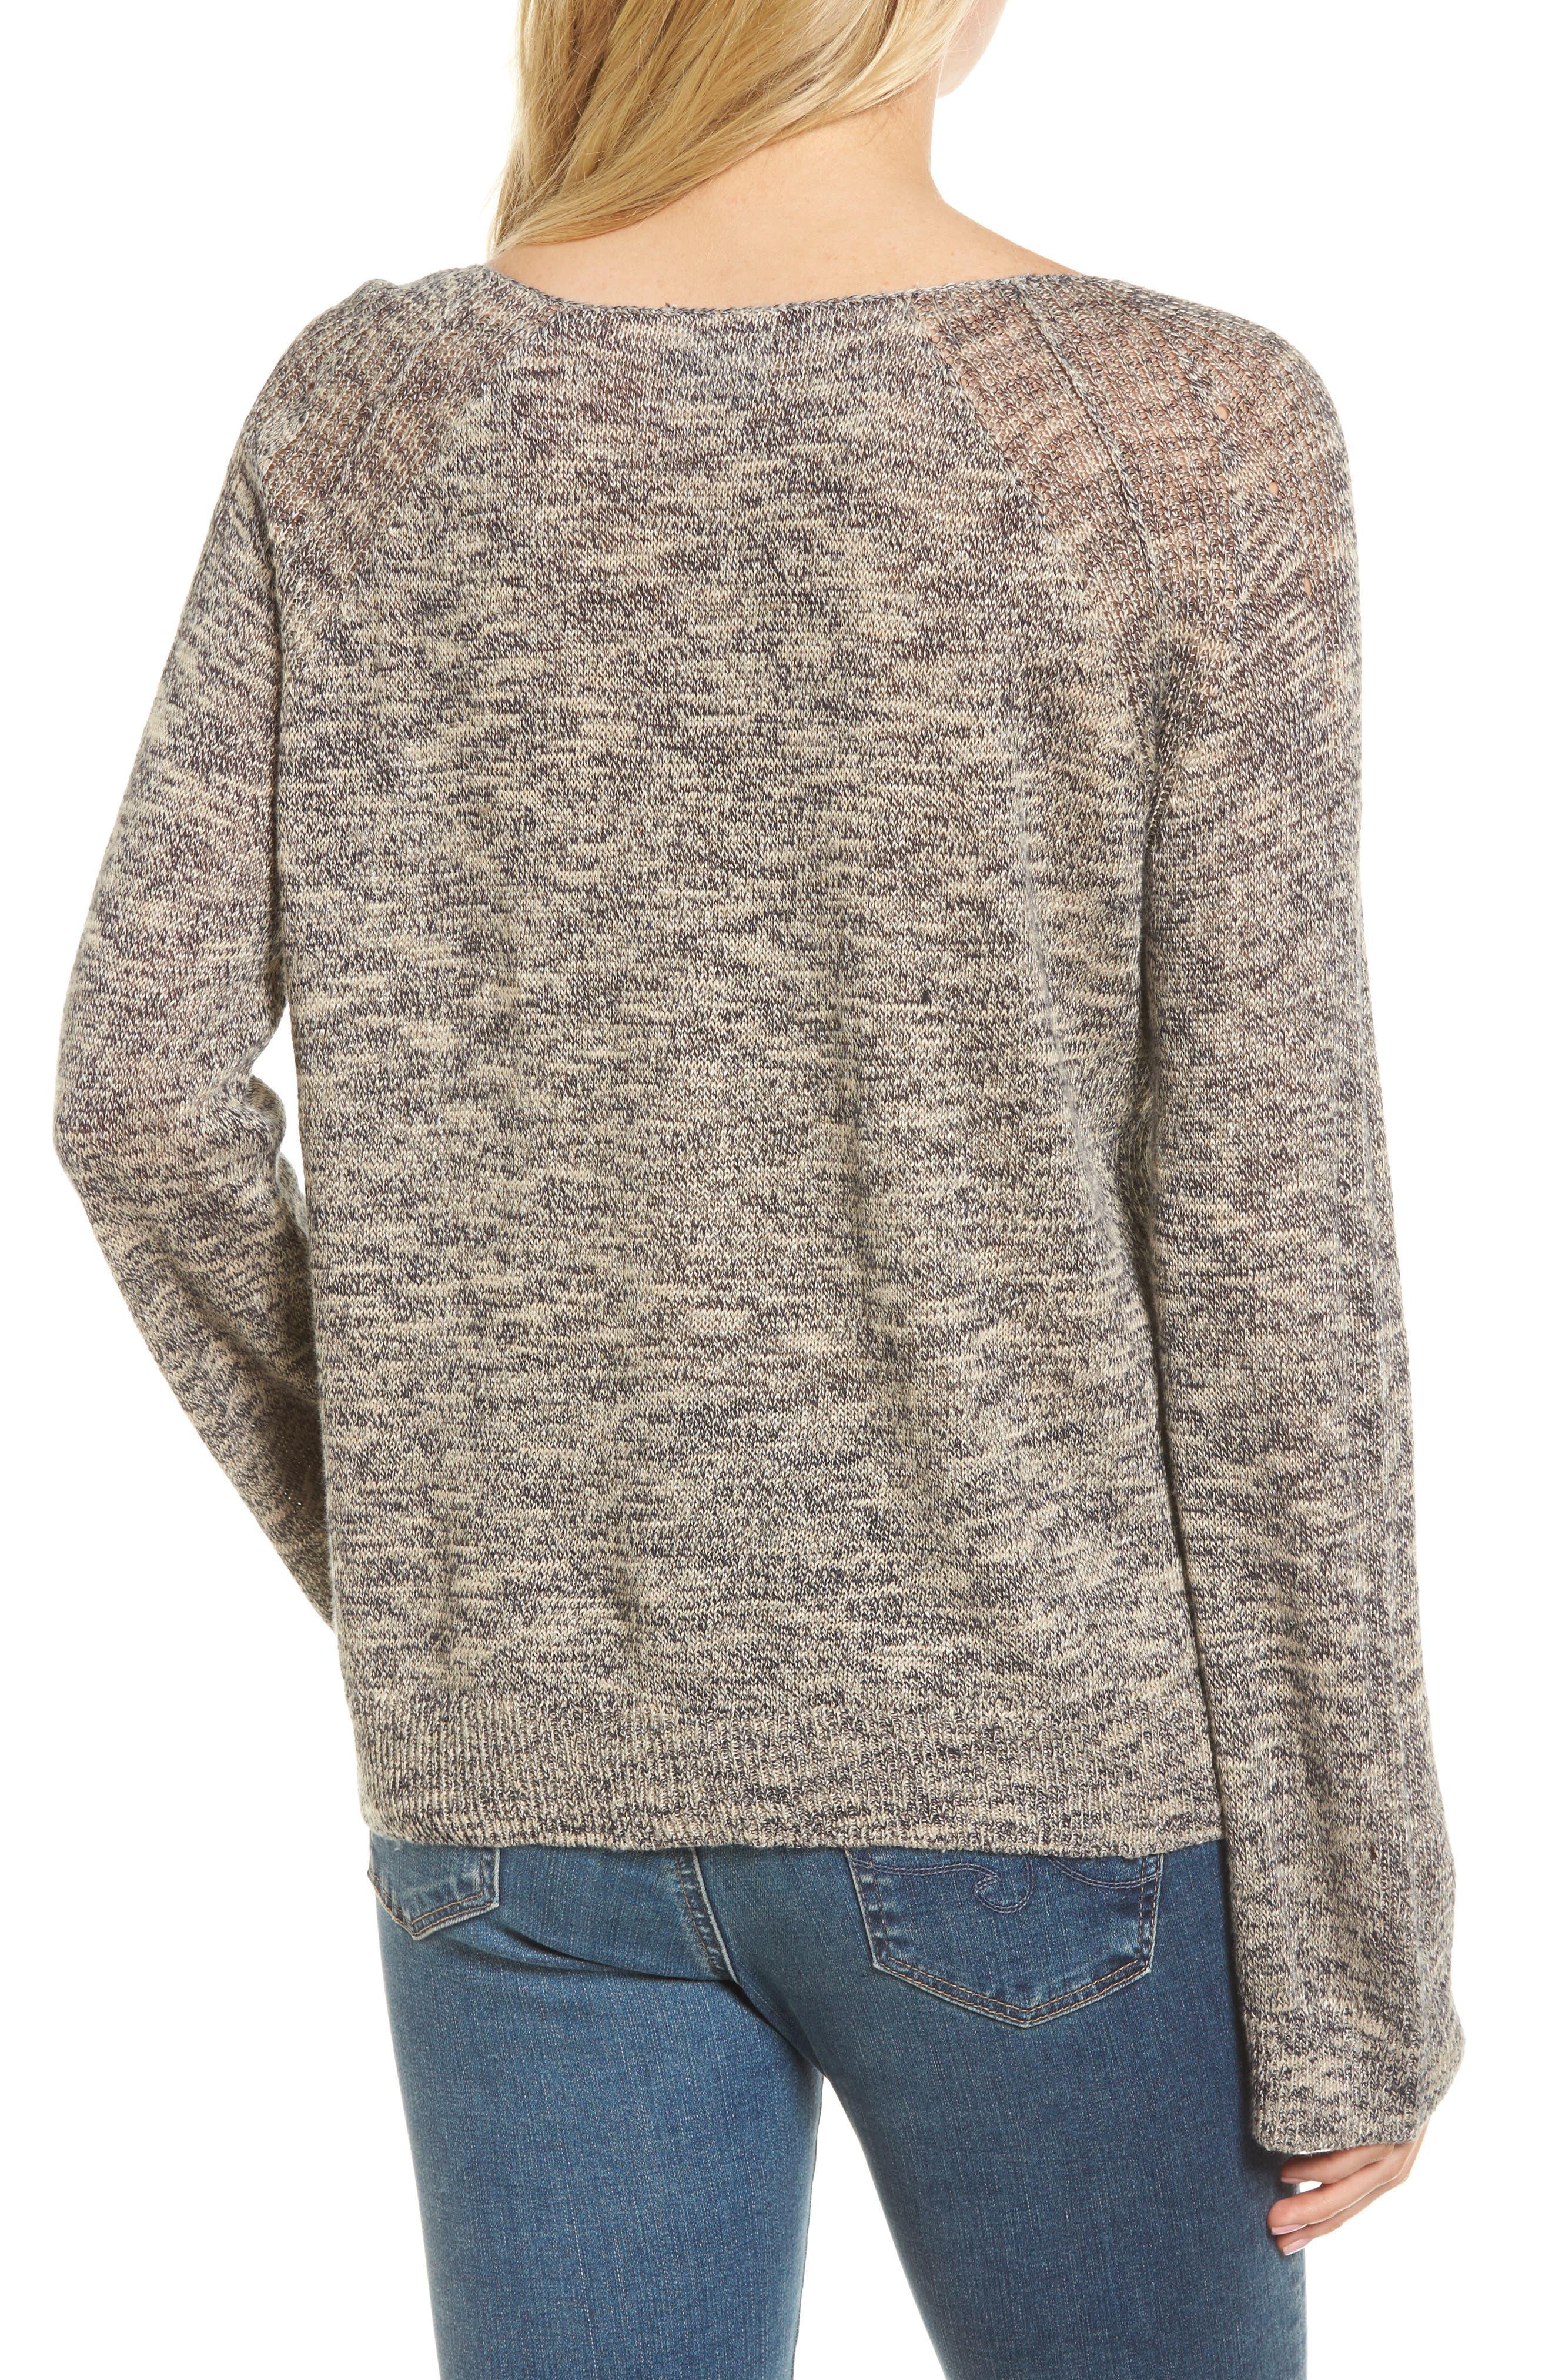 Flora Sweater,                             Alternate thumbnail 2, color,                             Speckled Navy/ Beige